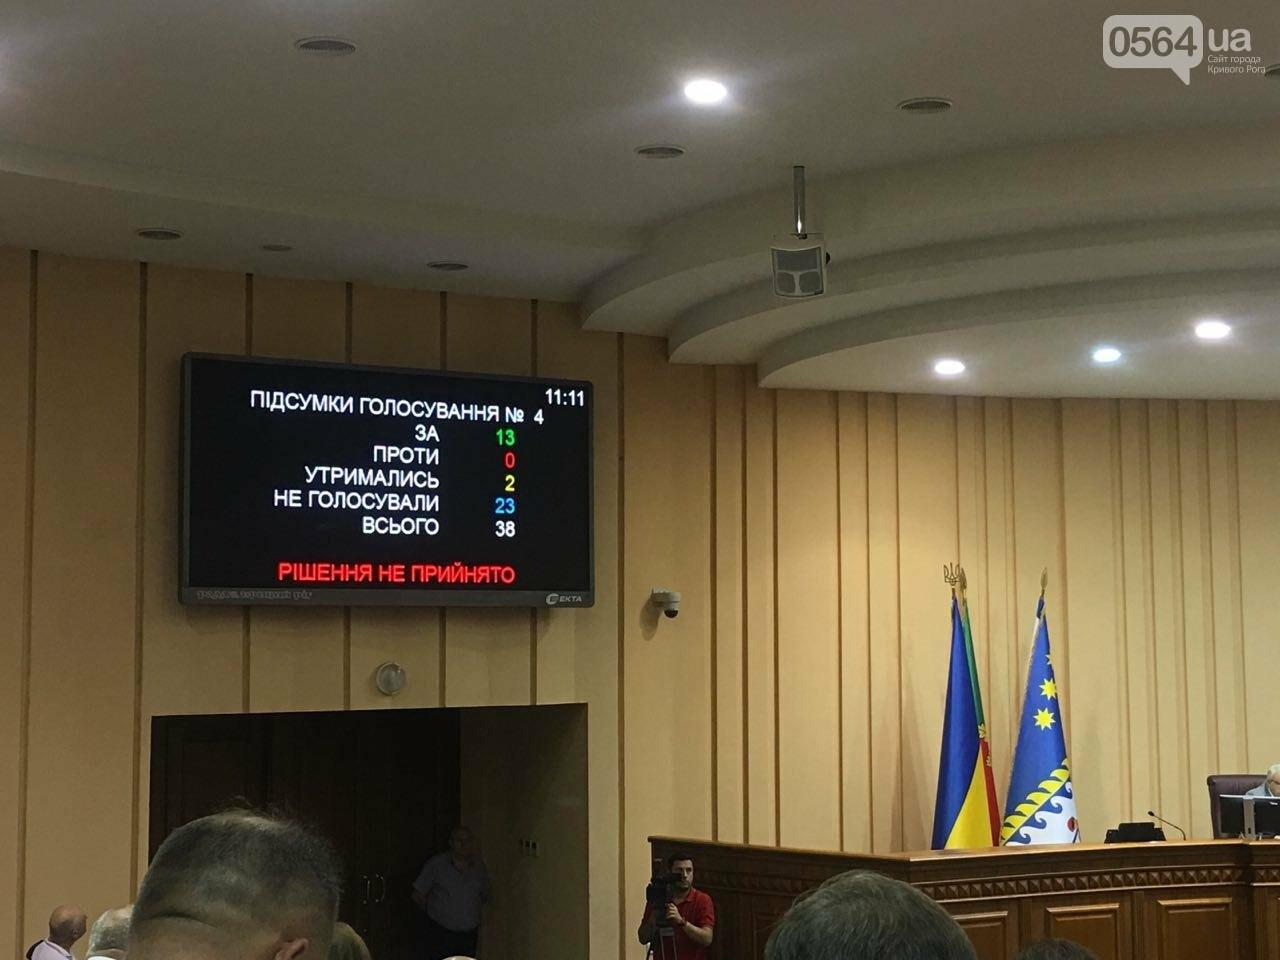 Криворожский горсовет не поддержал петицию о запрете Марша равенства, - ФОТО, фото-1